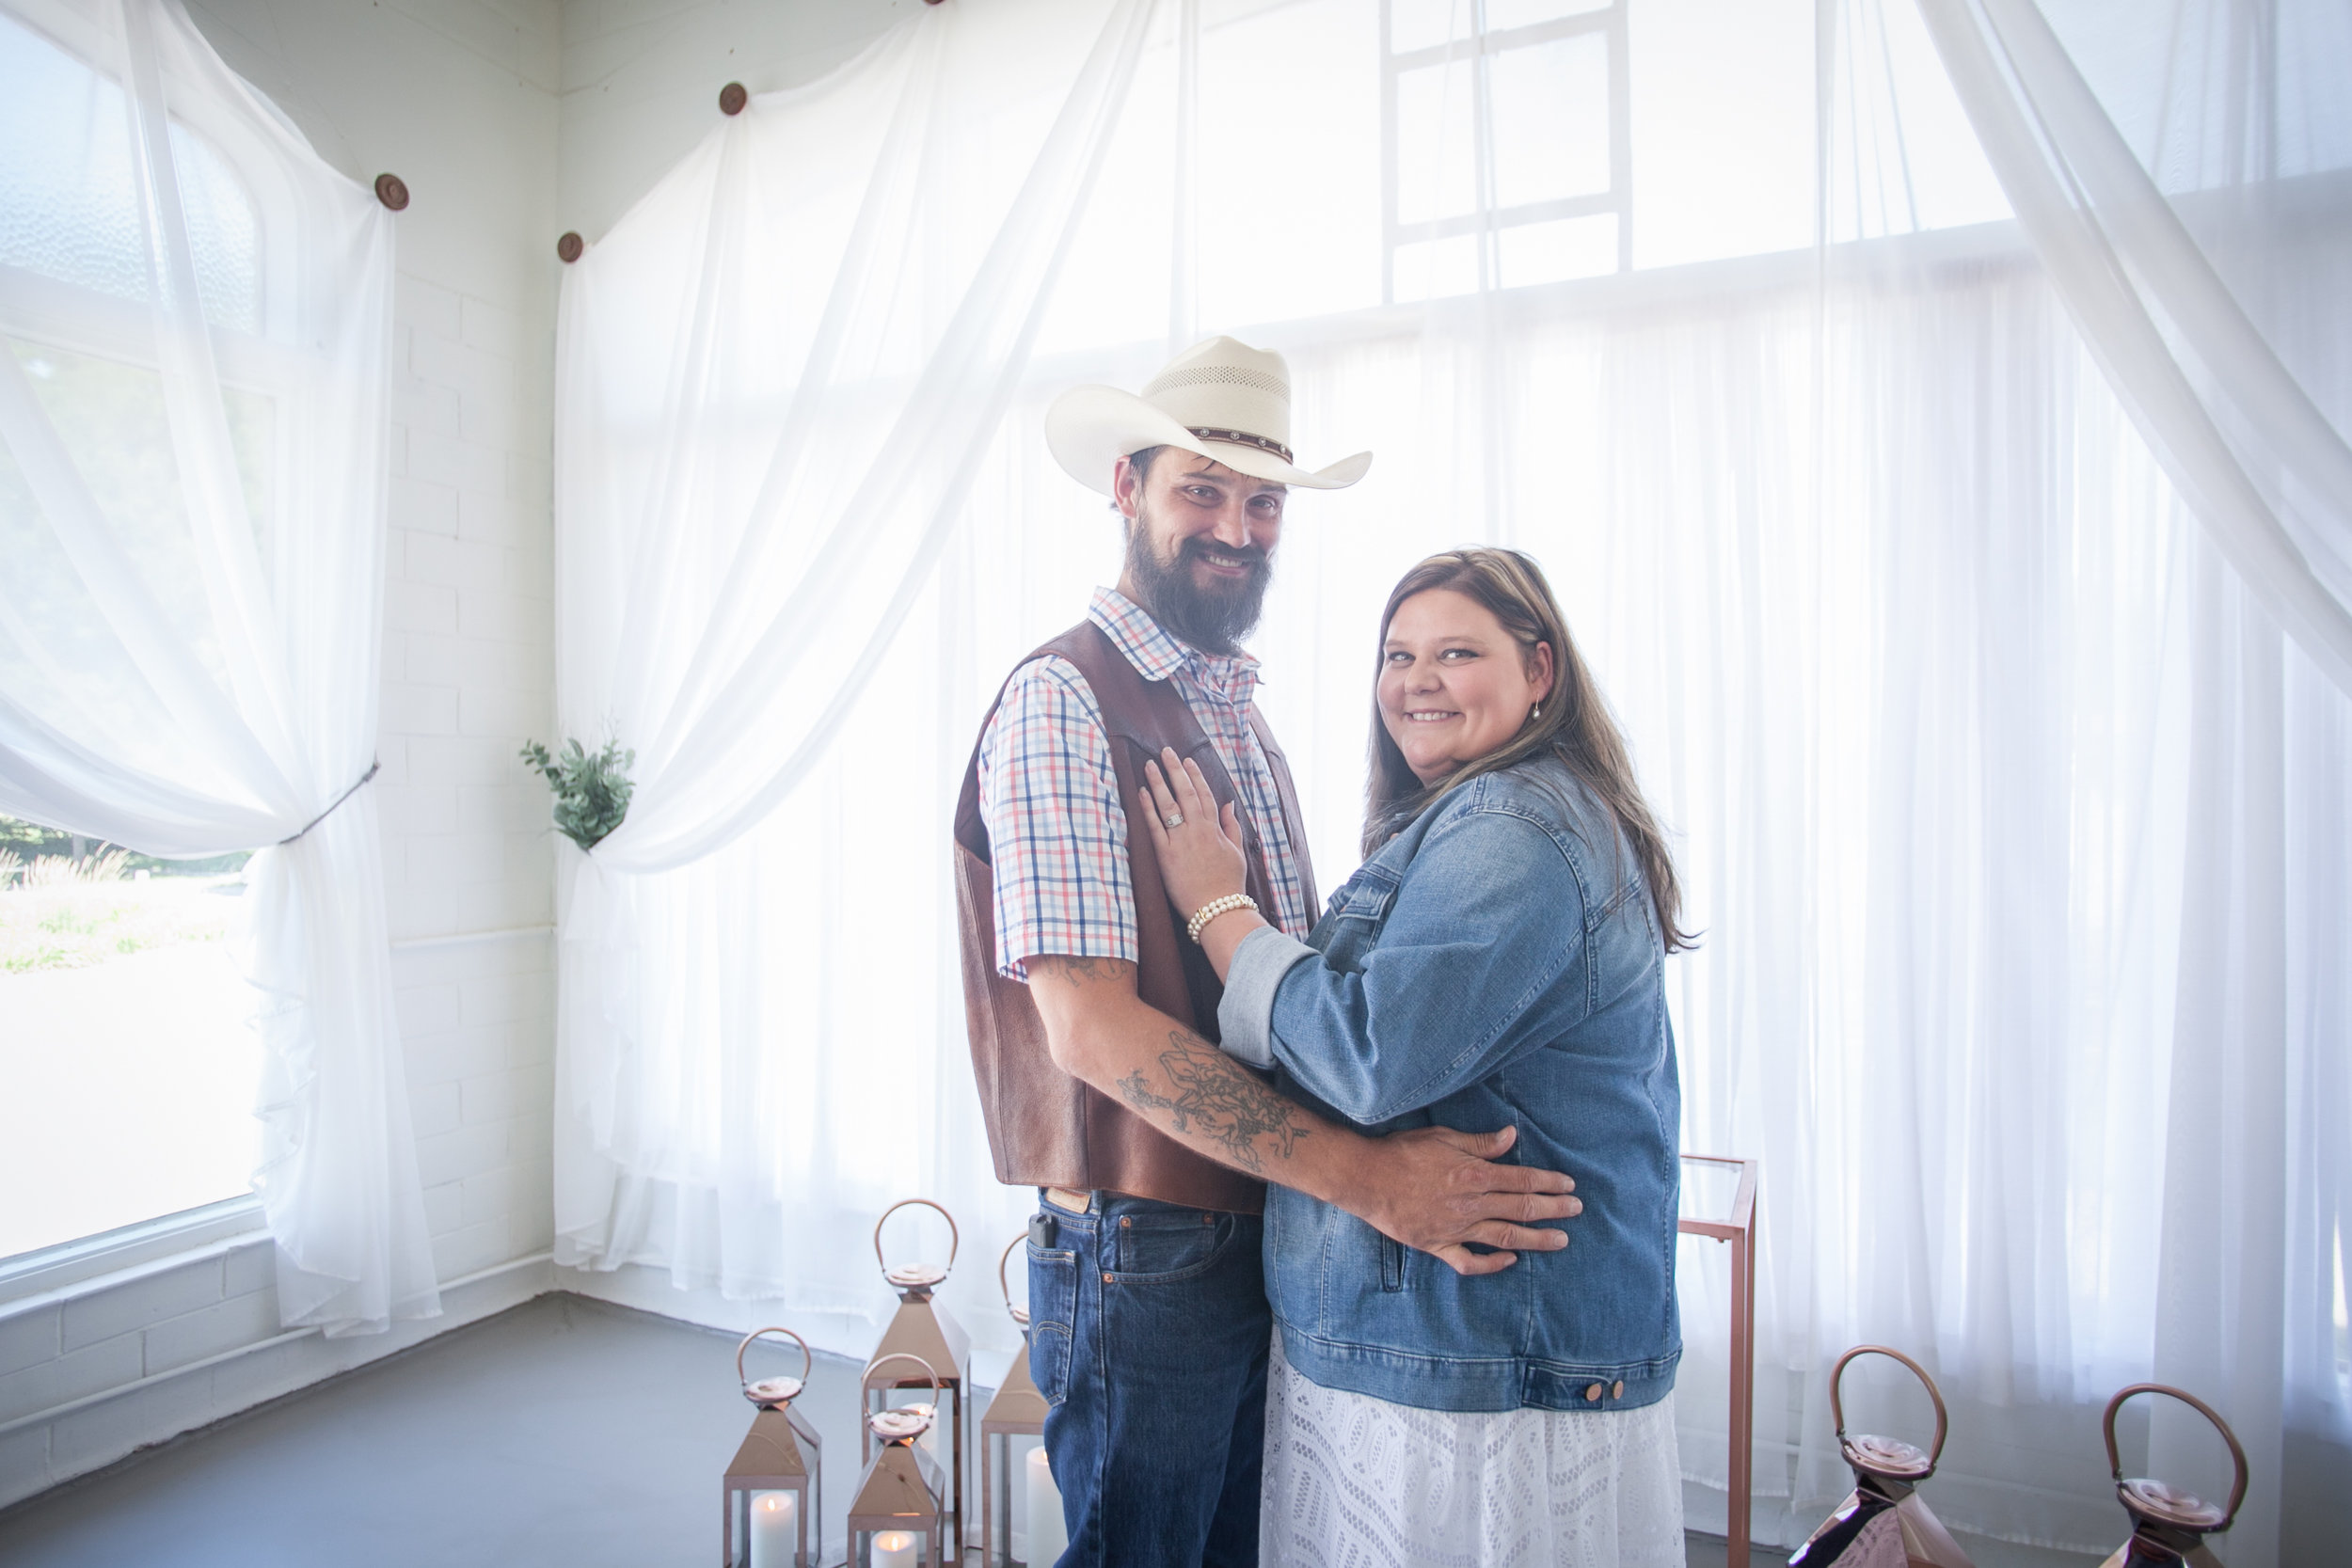 Kansas_City_Small_Wedding_Venue_Elope_Intimate_Ceremony_Budget_Affordable_Wedding Day-85.jpg